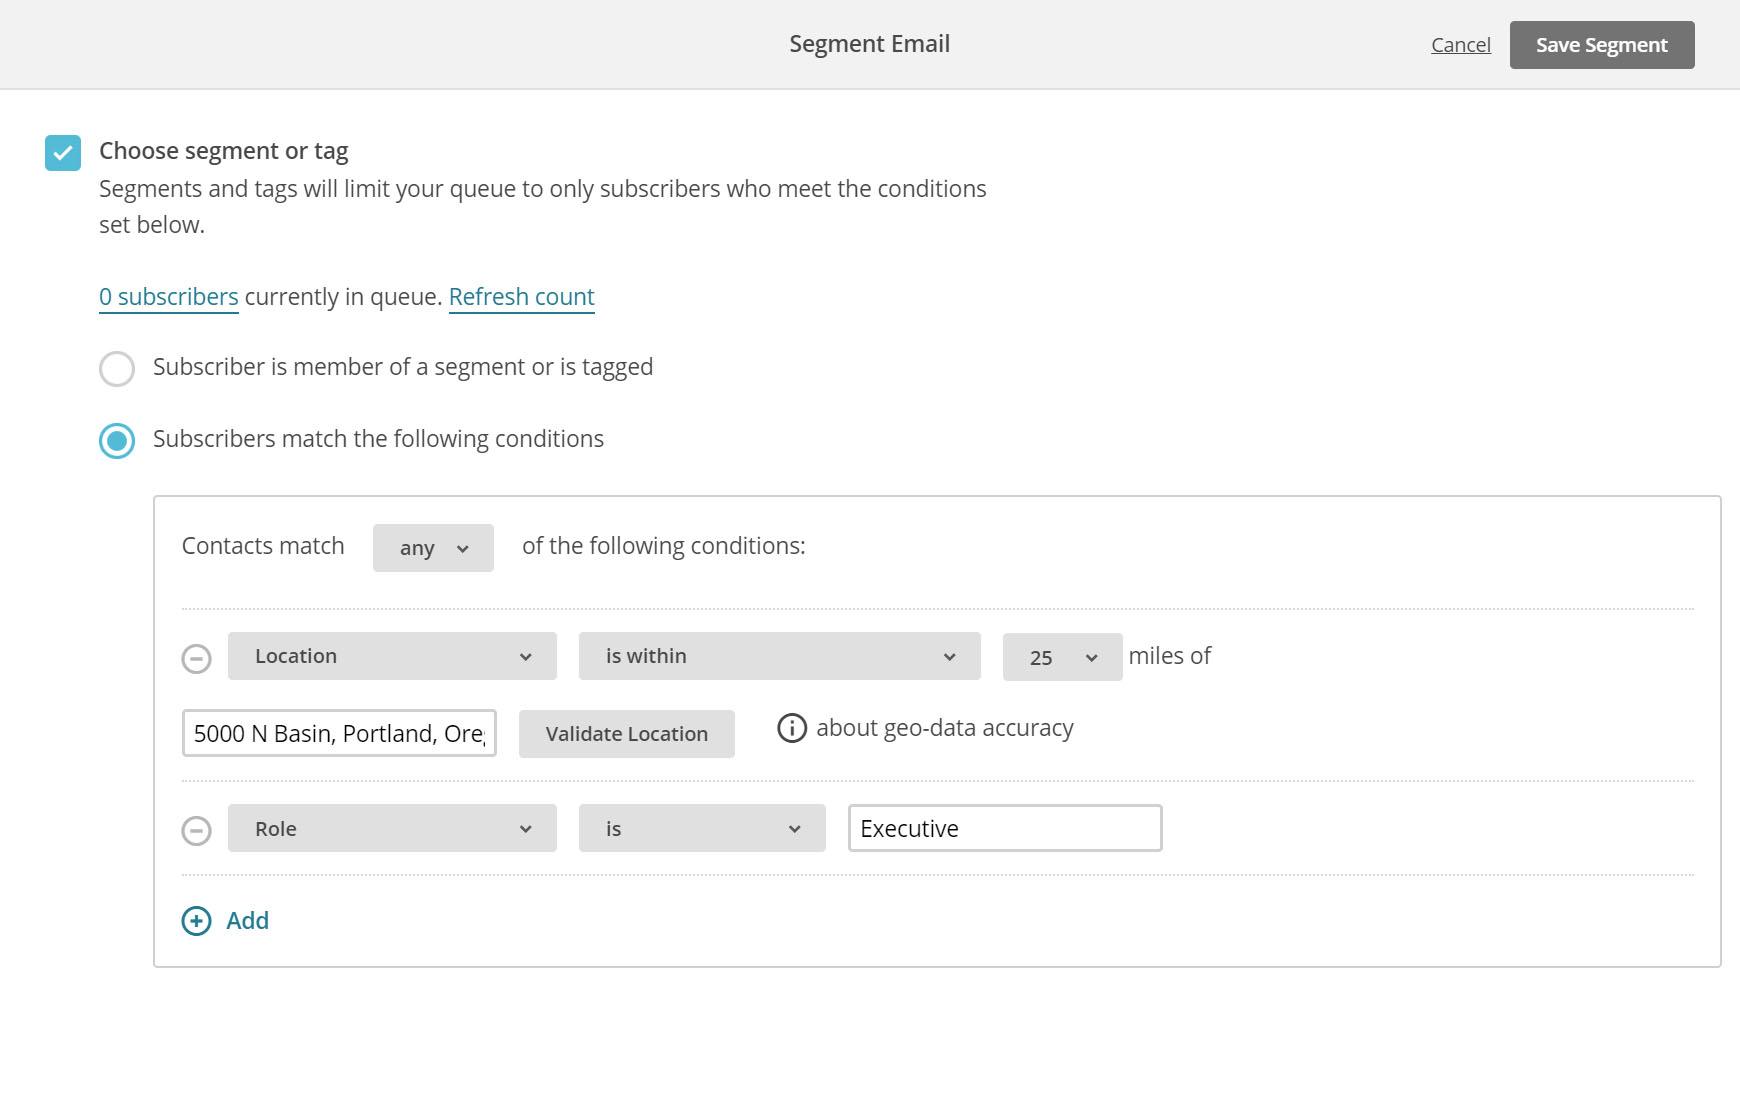 MailChimp marketing automation segmentation capabilities